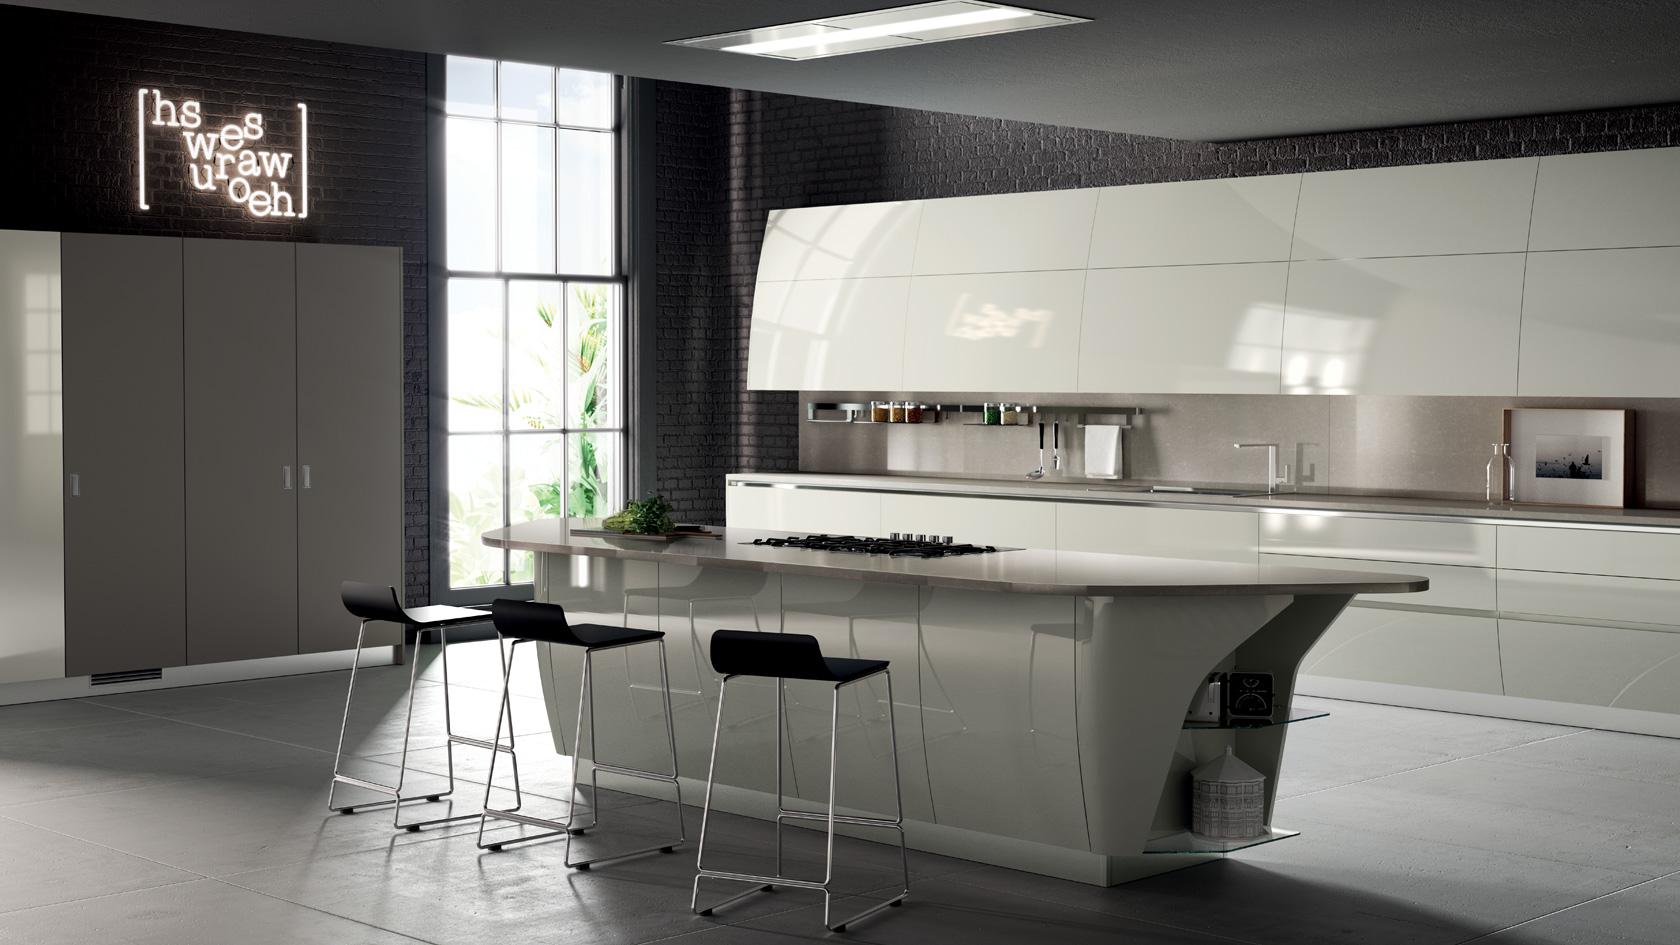 Cucina Moderna Scavolini Flux Swing-mobili incardone